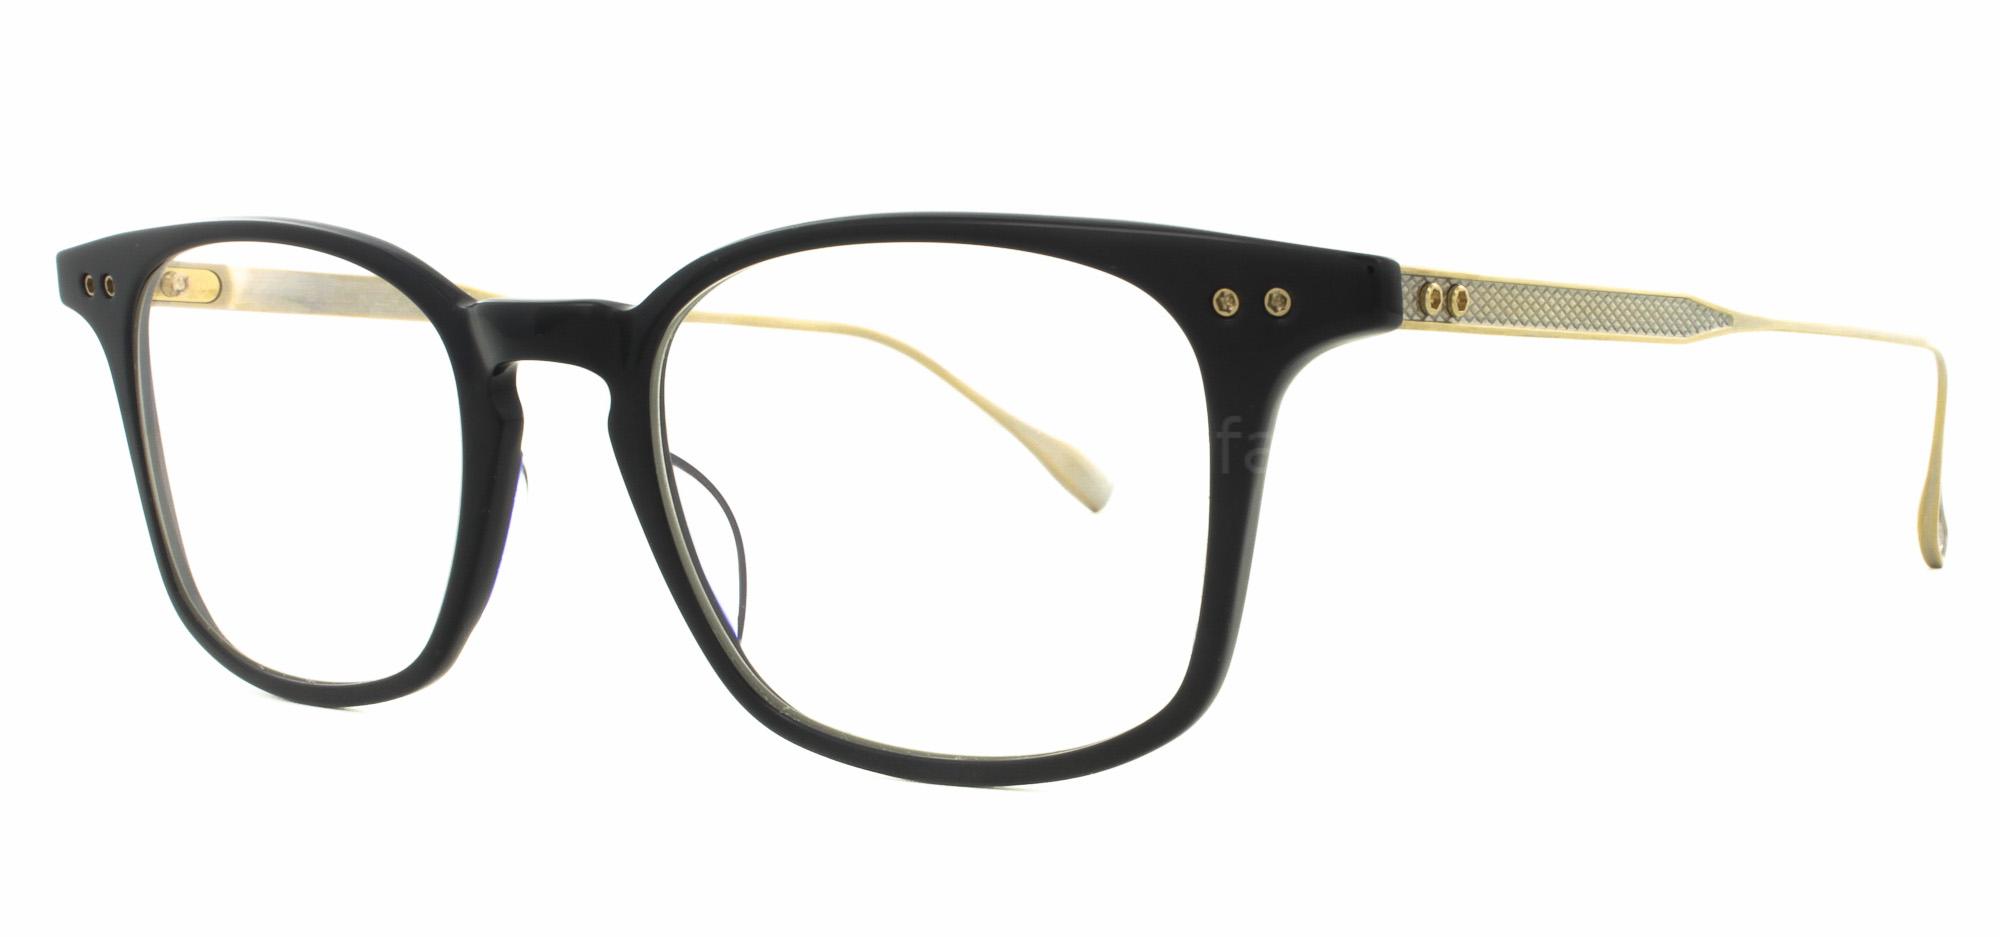 5bb7baf14766 Dita BUCKEYE 2072 Eyeglasses